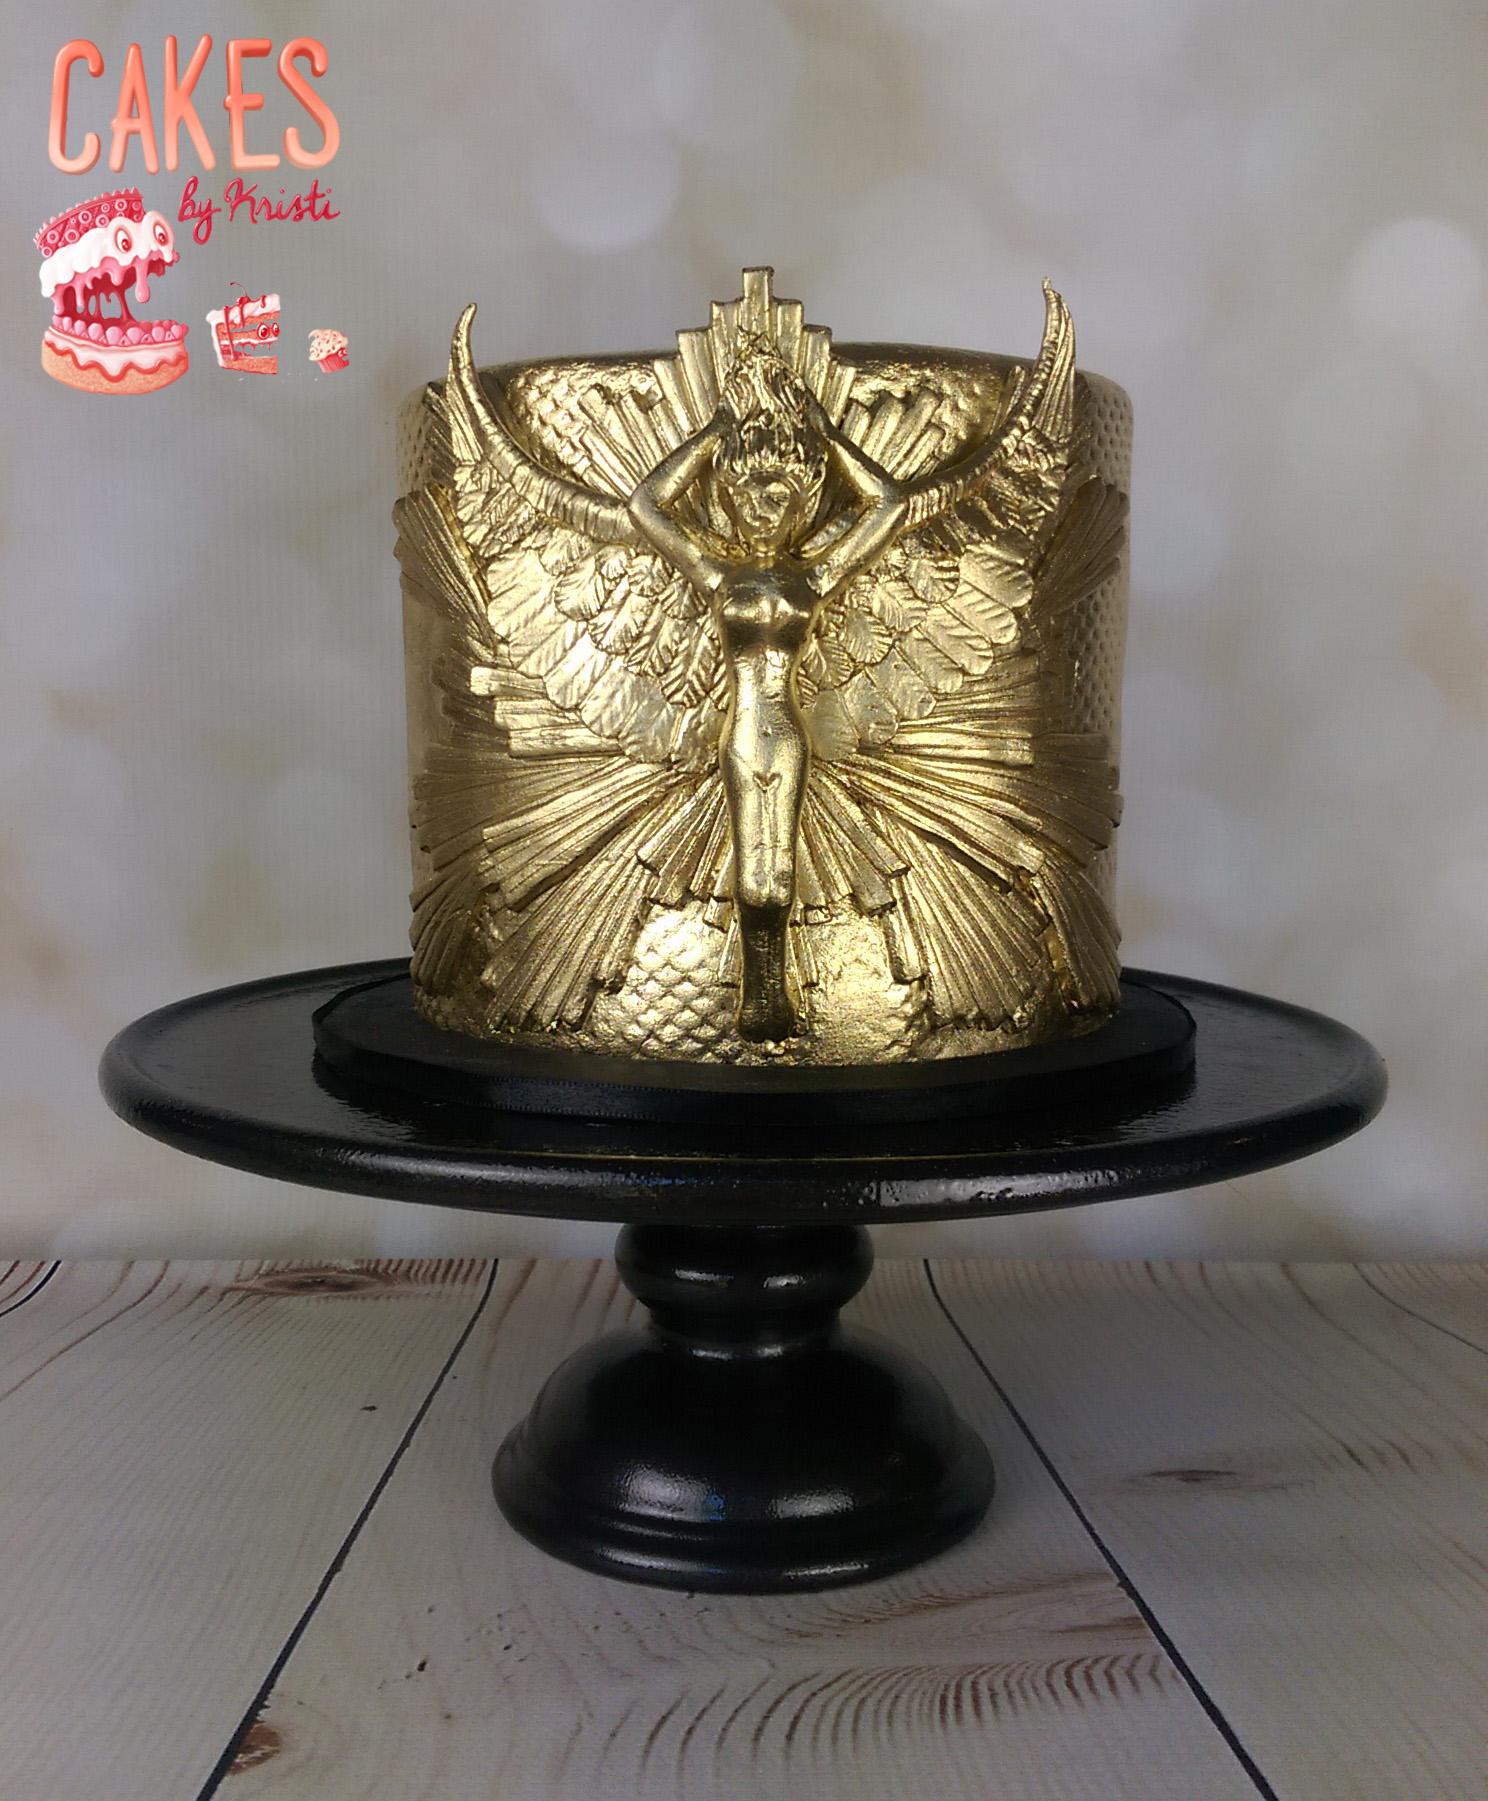 Gold fondant cake with metallic angel